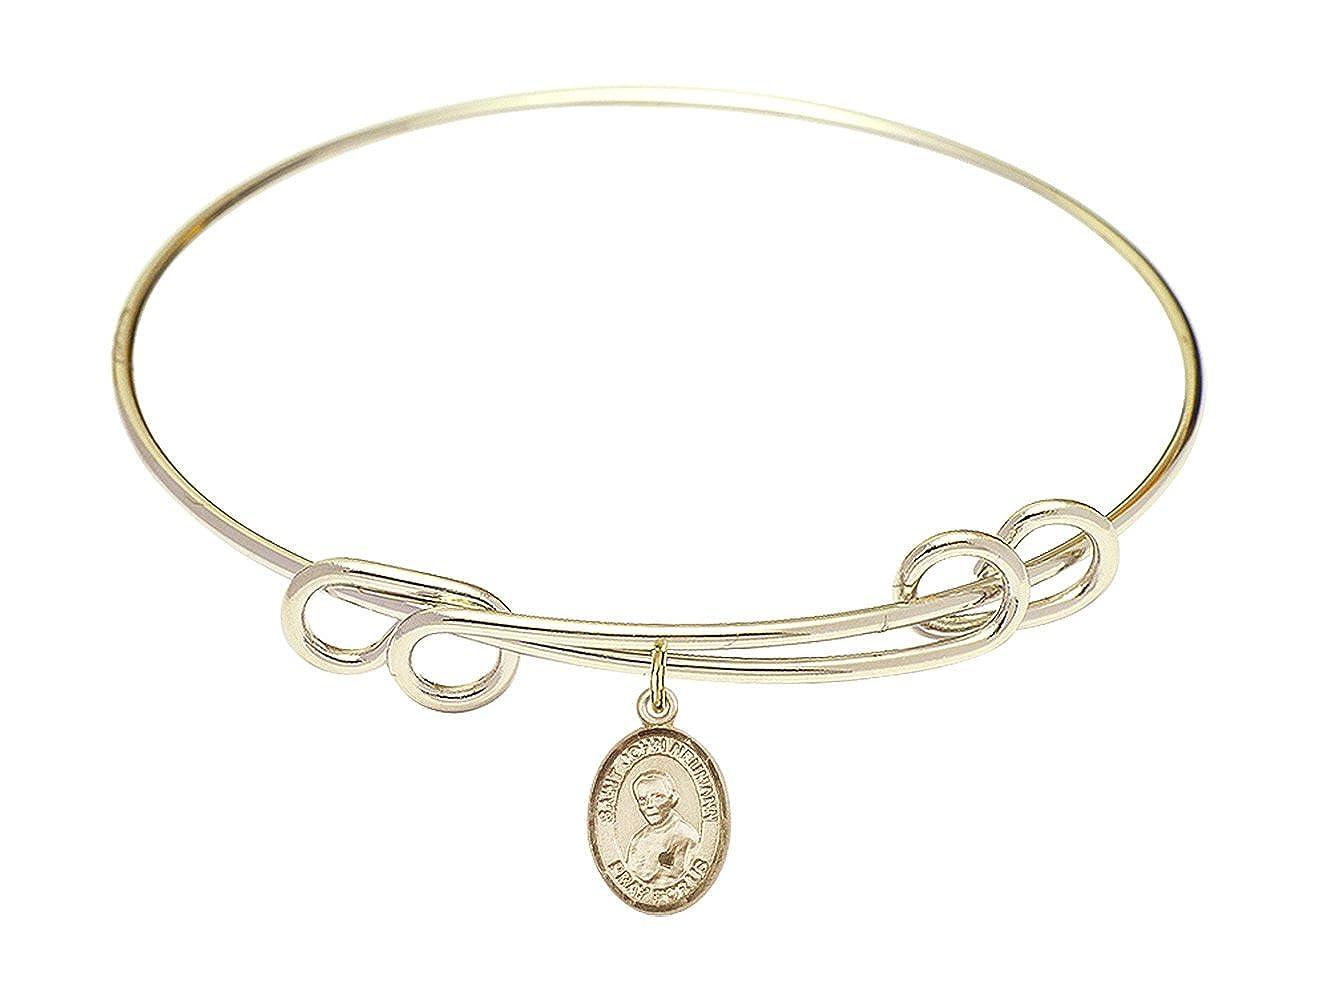 Bonyak Jewelry Round Double Loop Bangle Bracelet w//St John Neumann in Gold-Filled